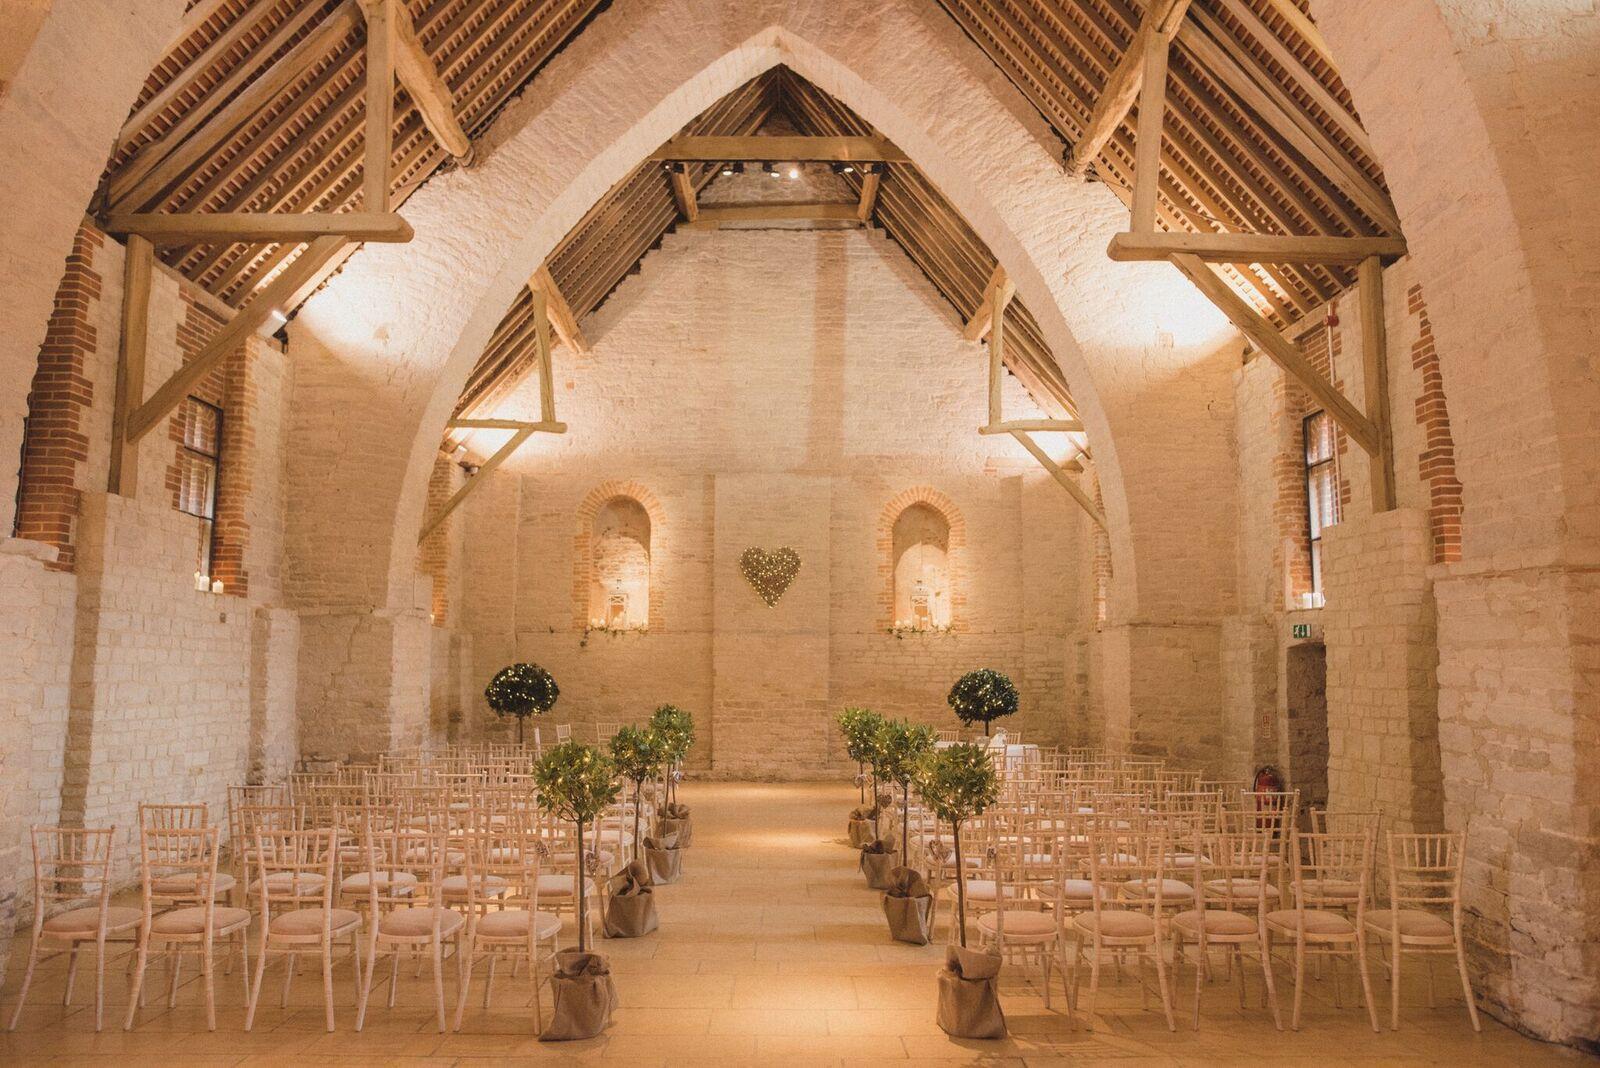 barn wedding venue london%0A The Tithe Barn   Your Wedding Your Way   Rachel and Steven